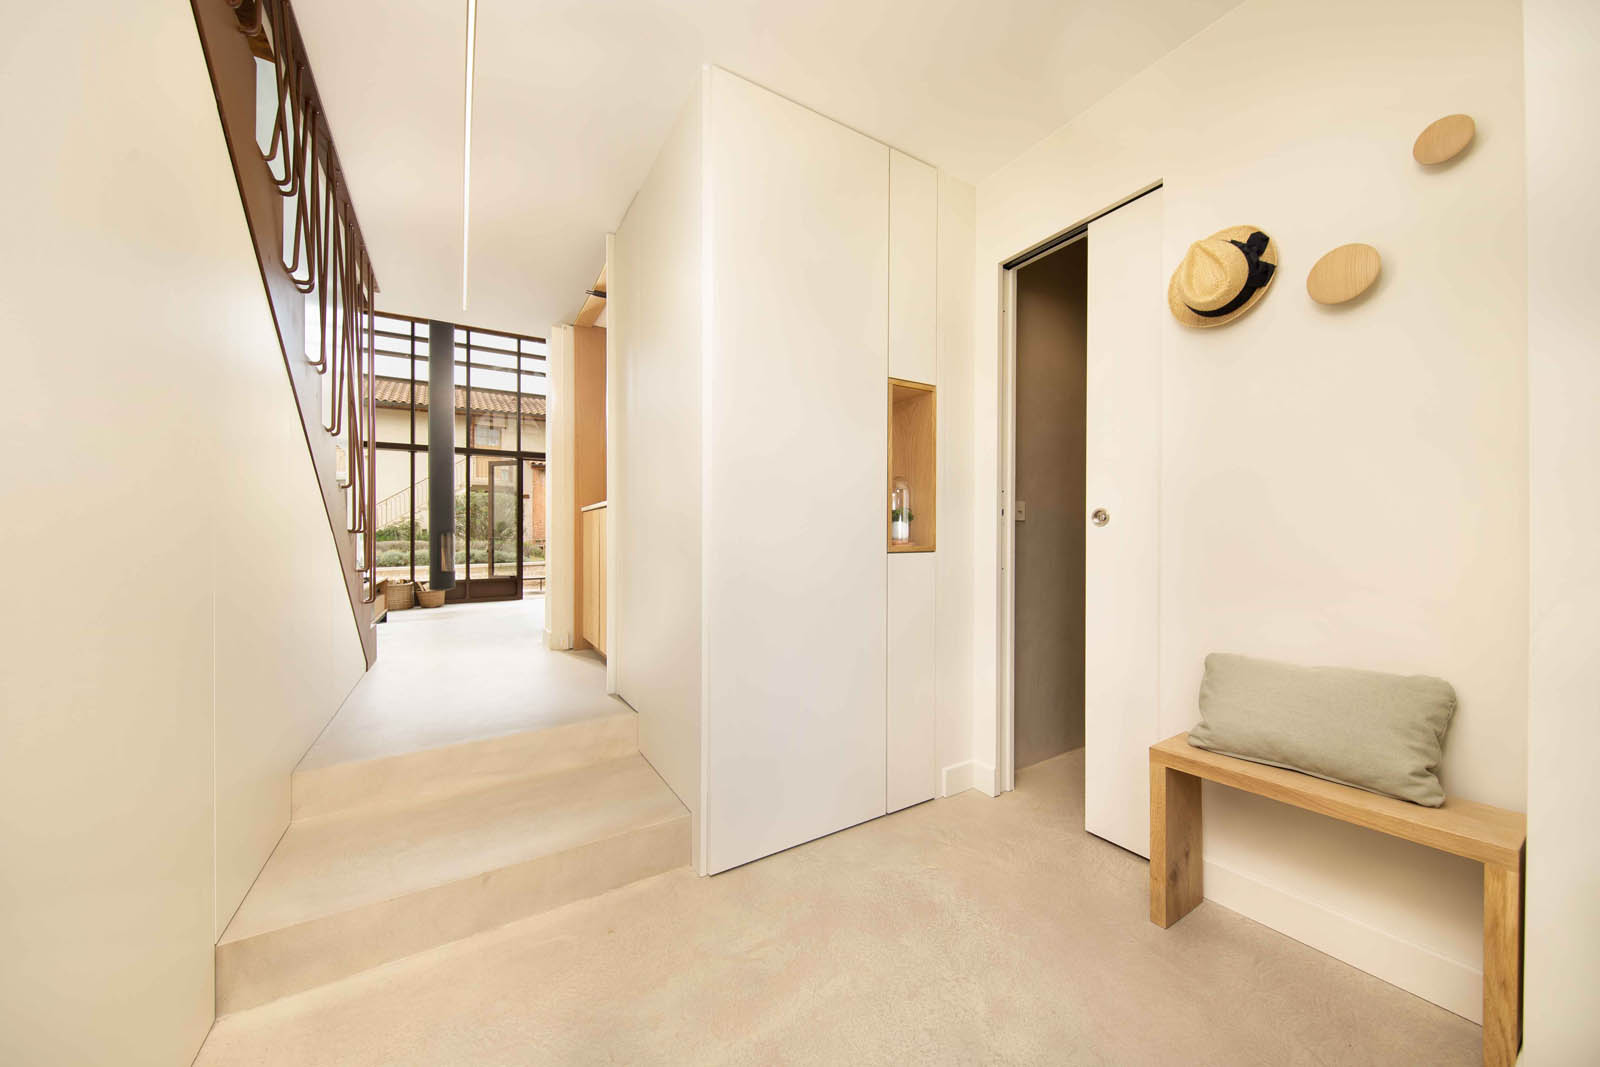 04_renovation-interieur_Invivhome-Idésia ©StudioRobinIssartel